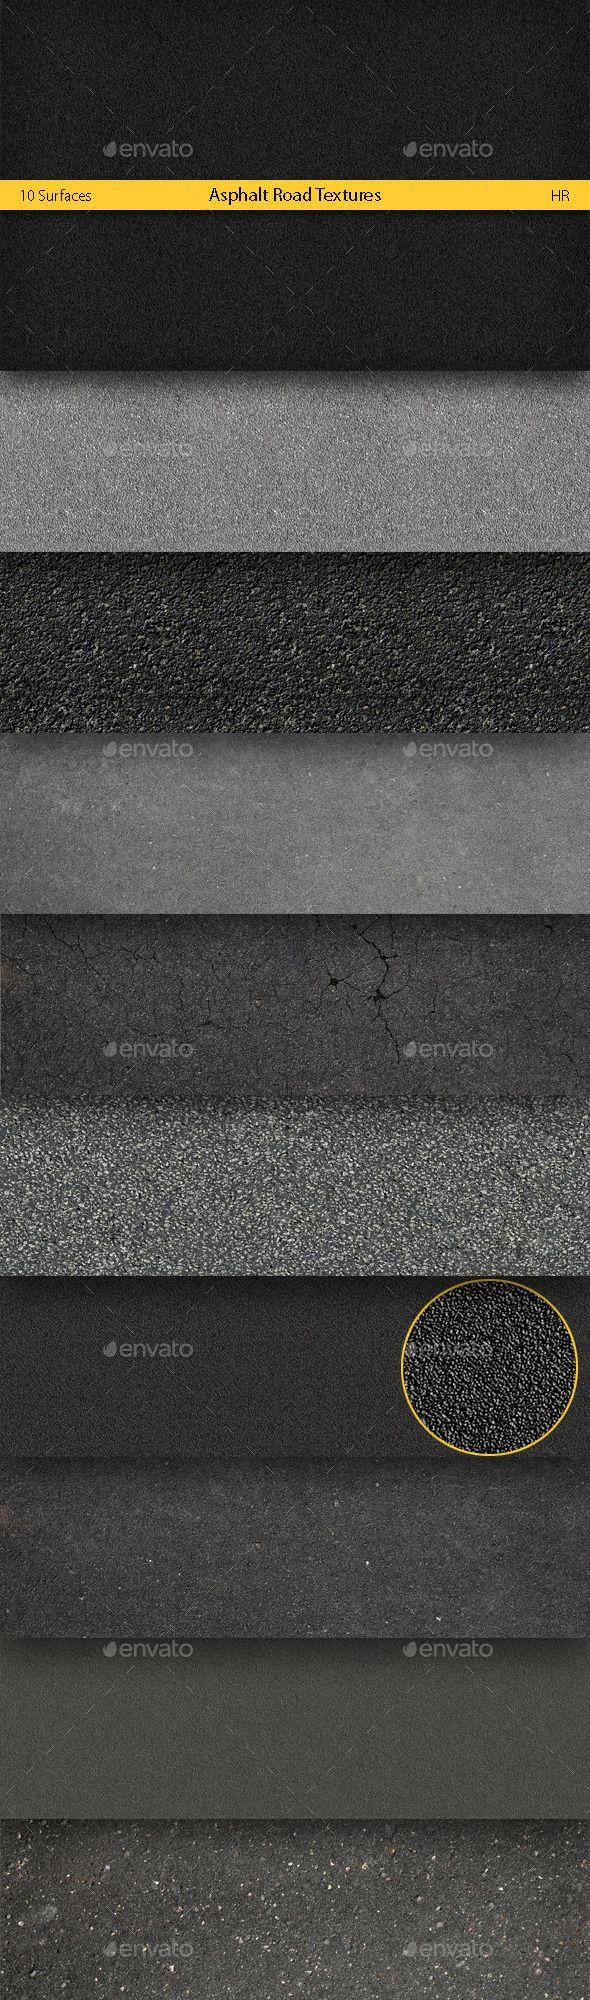 Asphalt Road Textures Backgrounds by artremizov Ten different realistic textures Asphalt Road Surface. Asphalt Road Styles. Great for your creativity, for website, 3d programs,